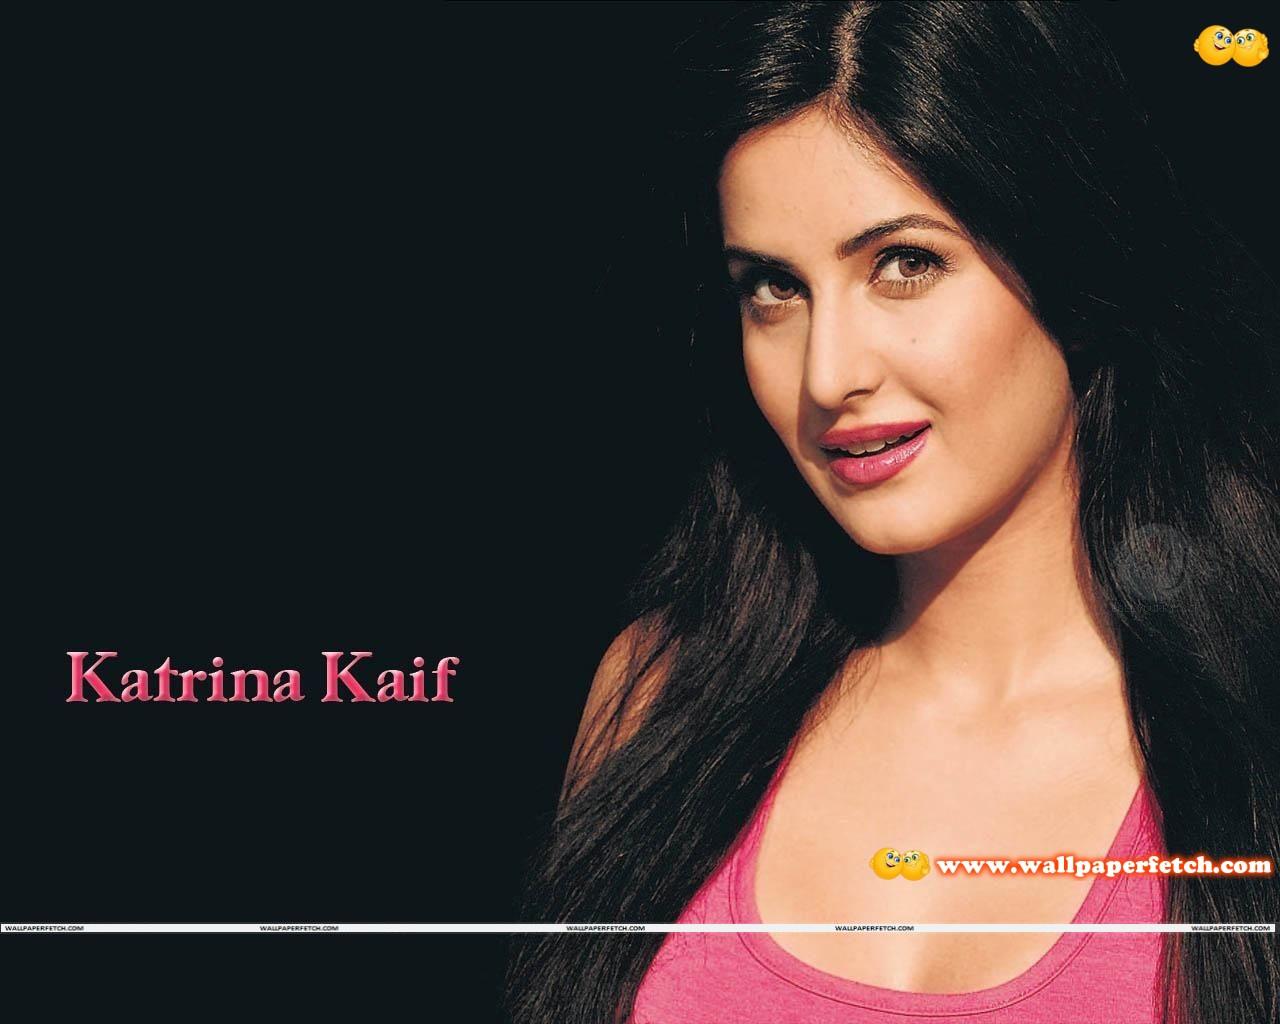 katrina kiaf wallpapers pack - photo #15